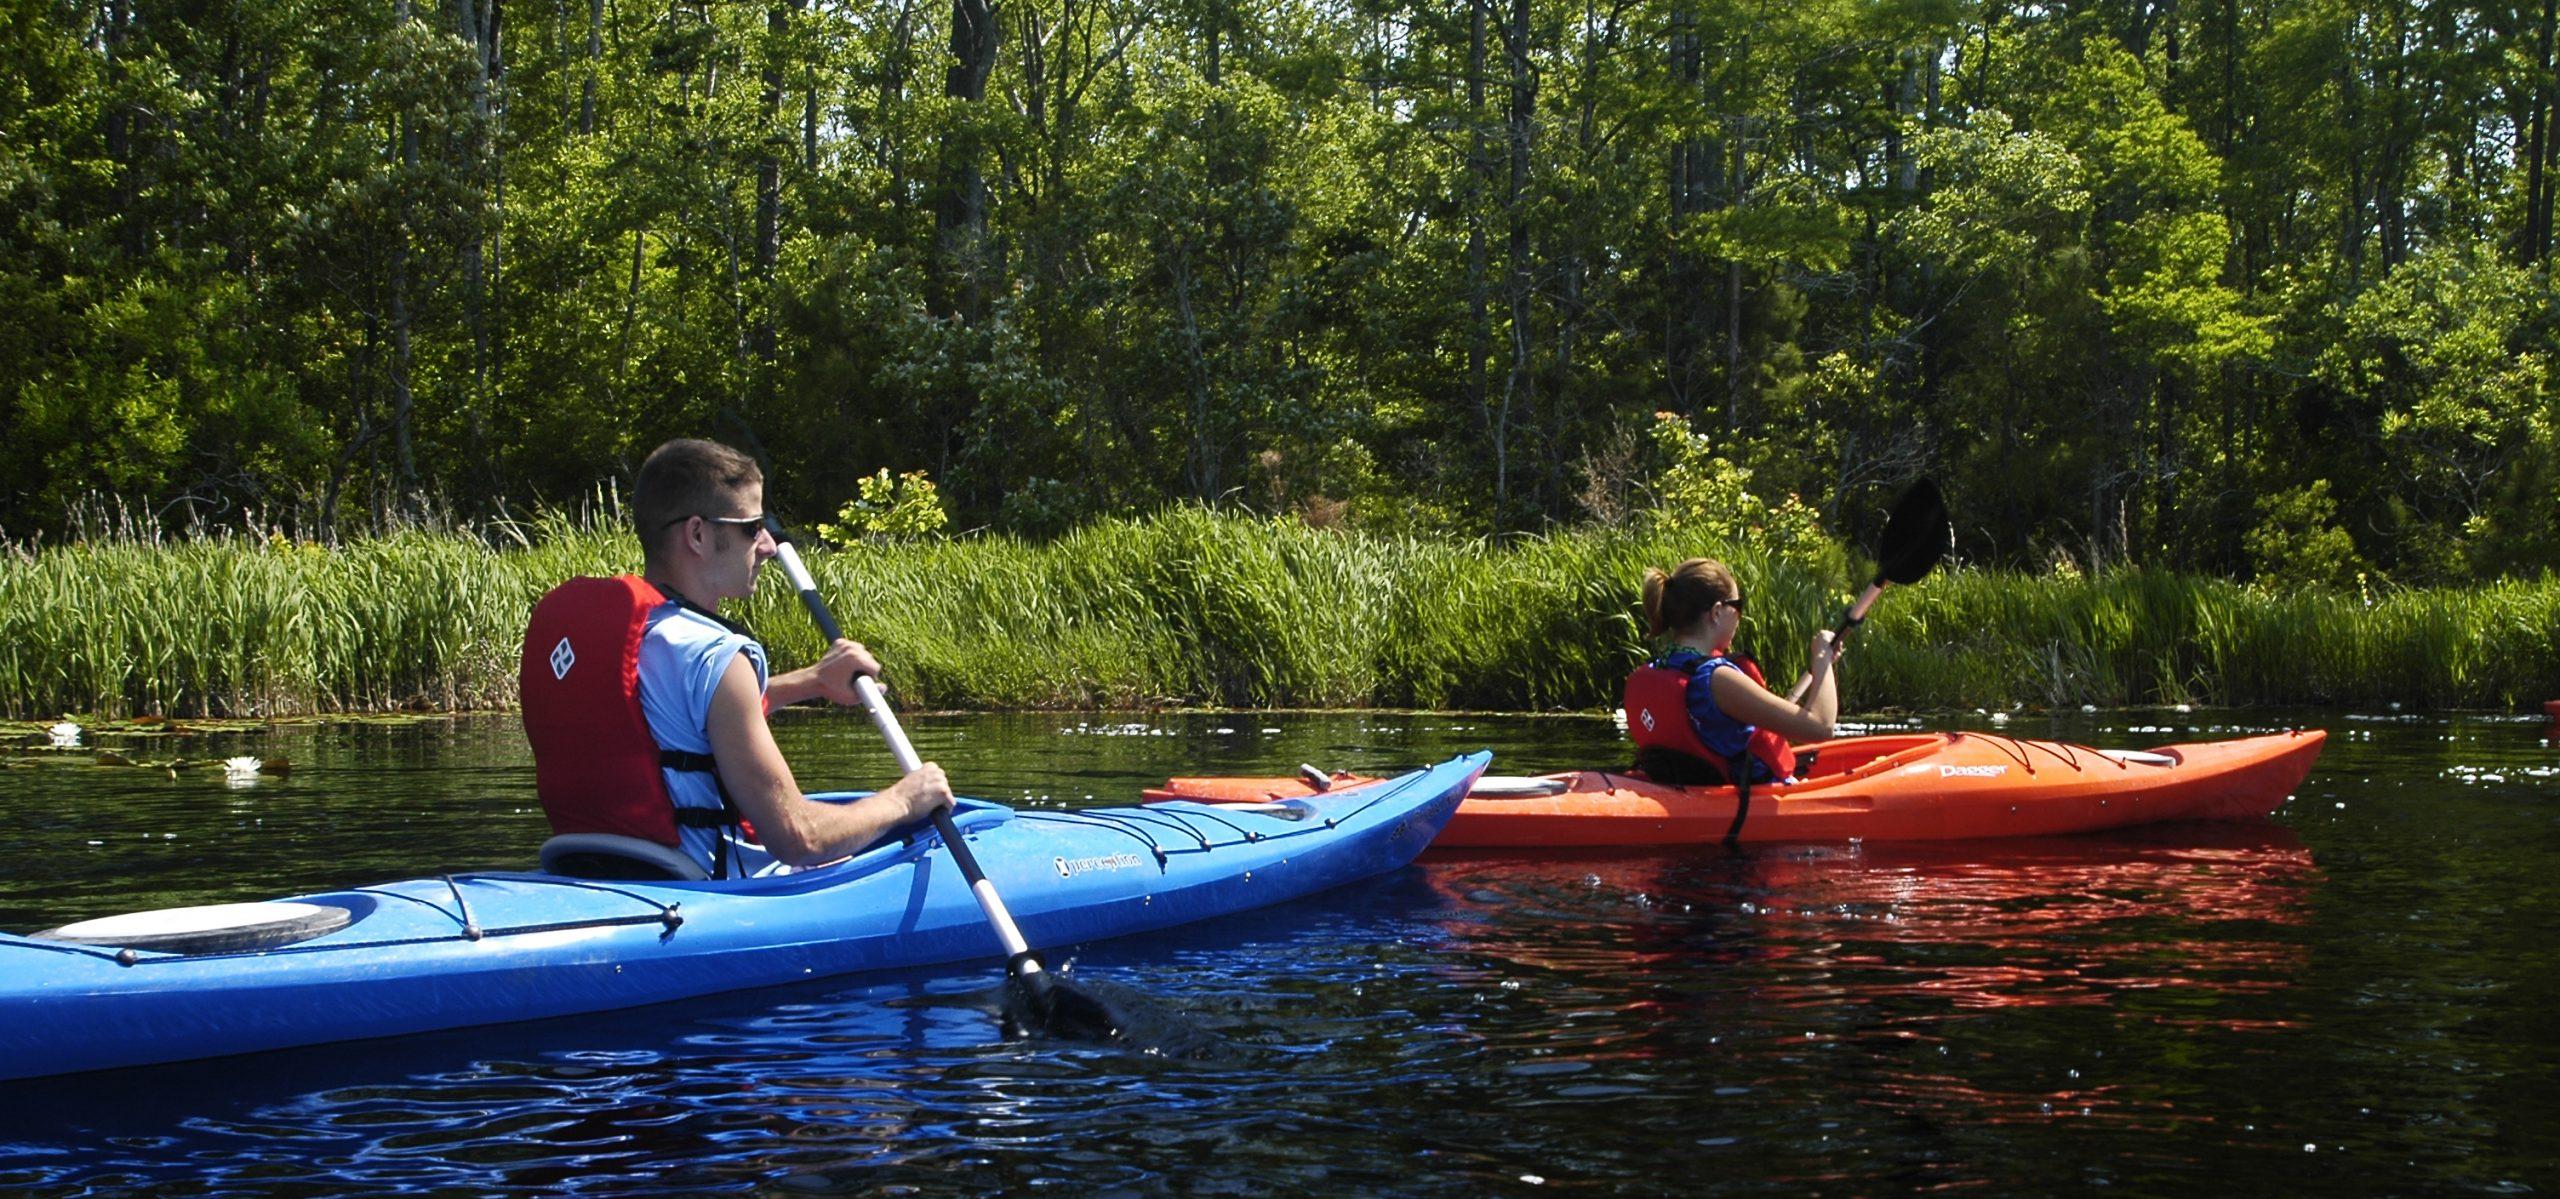 orange and blue kayaks at the Alligator River National Wildlife Refuge on the Outer Banks